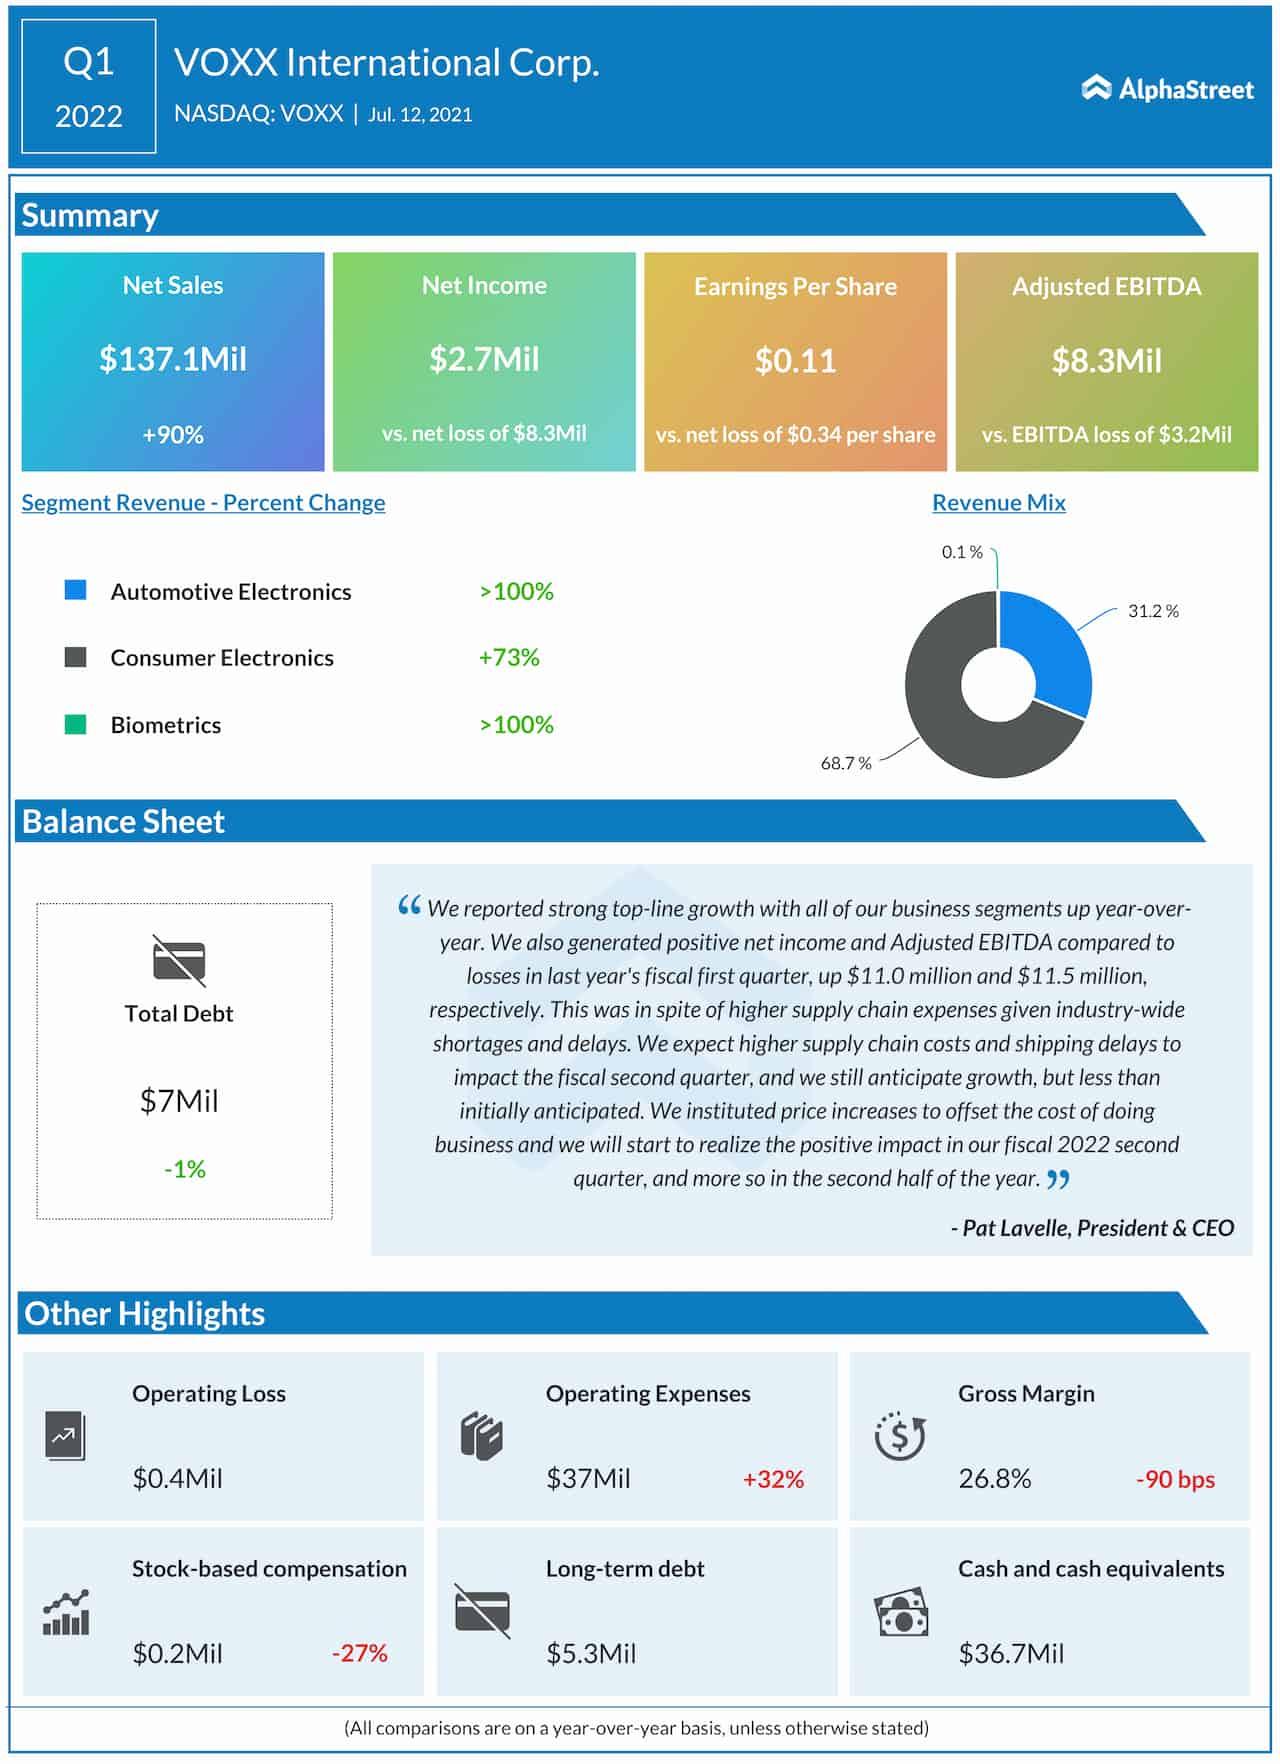 VOXX International Q1 2022 Earnings Infographic